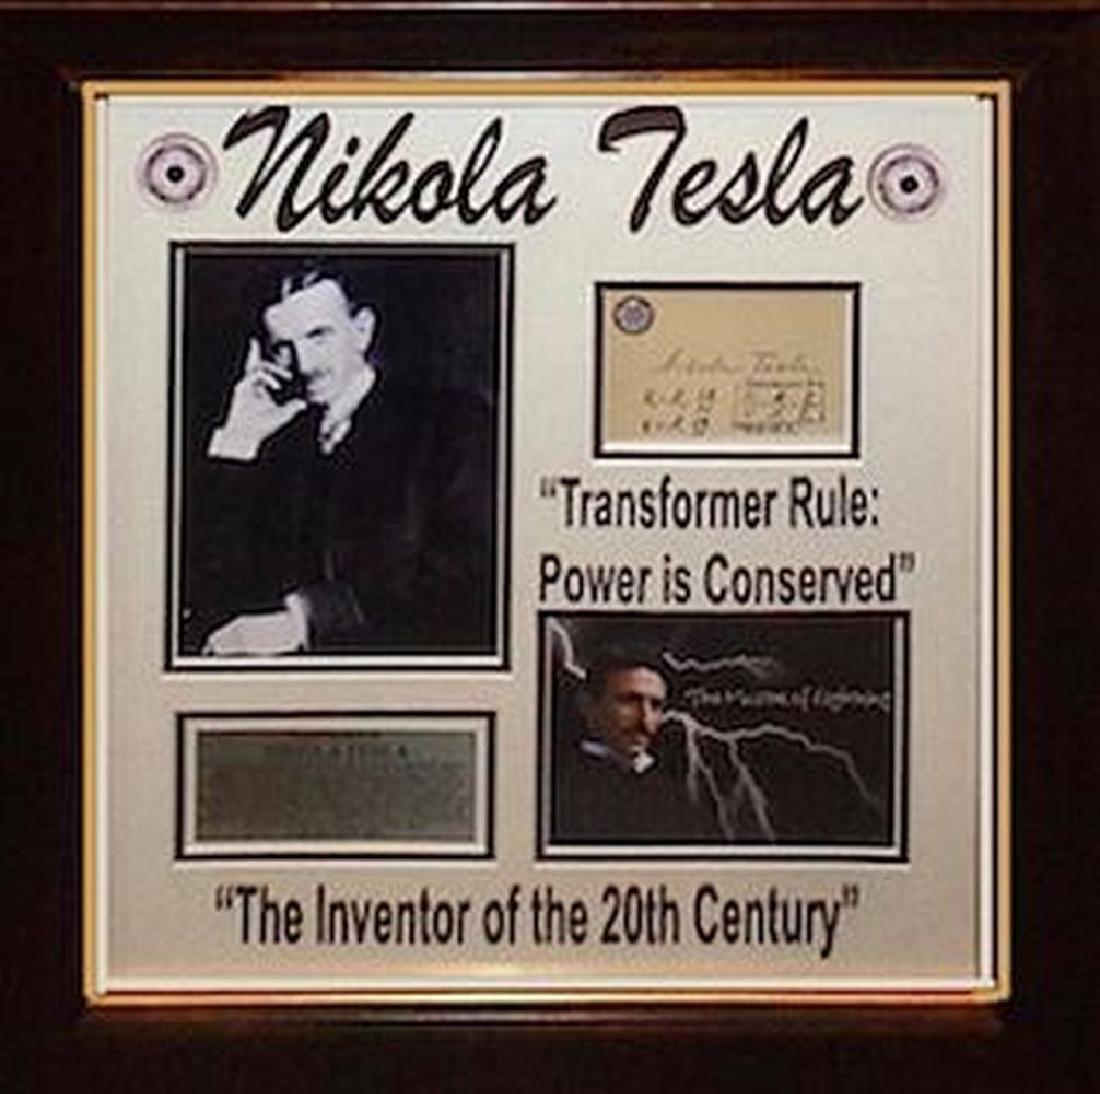 Nikola Tesla Autographed Signature Card Collage